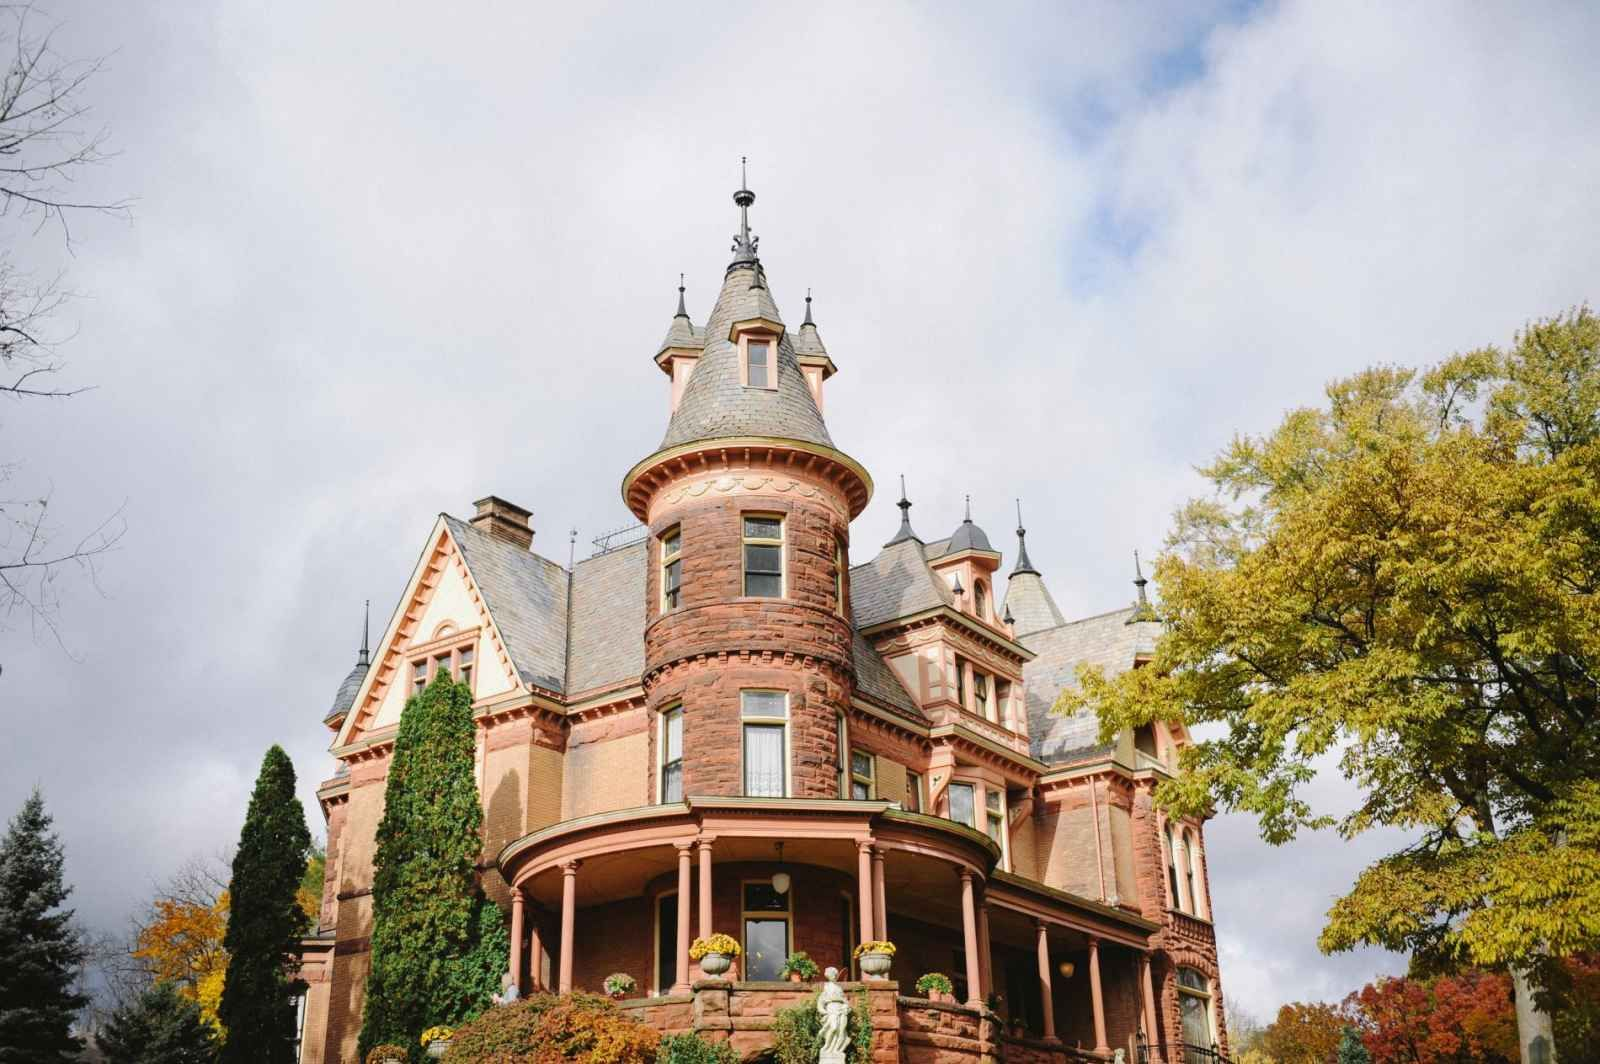 Henderson Castle Wedding Venue In Kalamazoo Michigan Something Old New